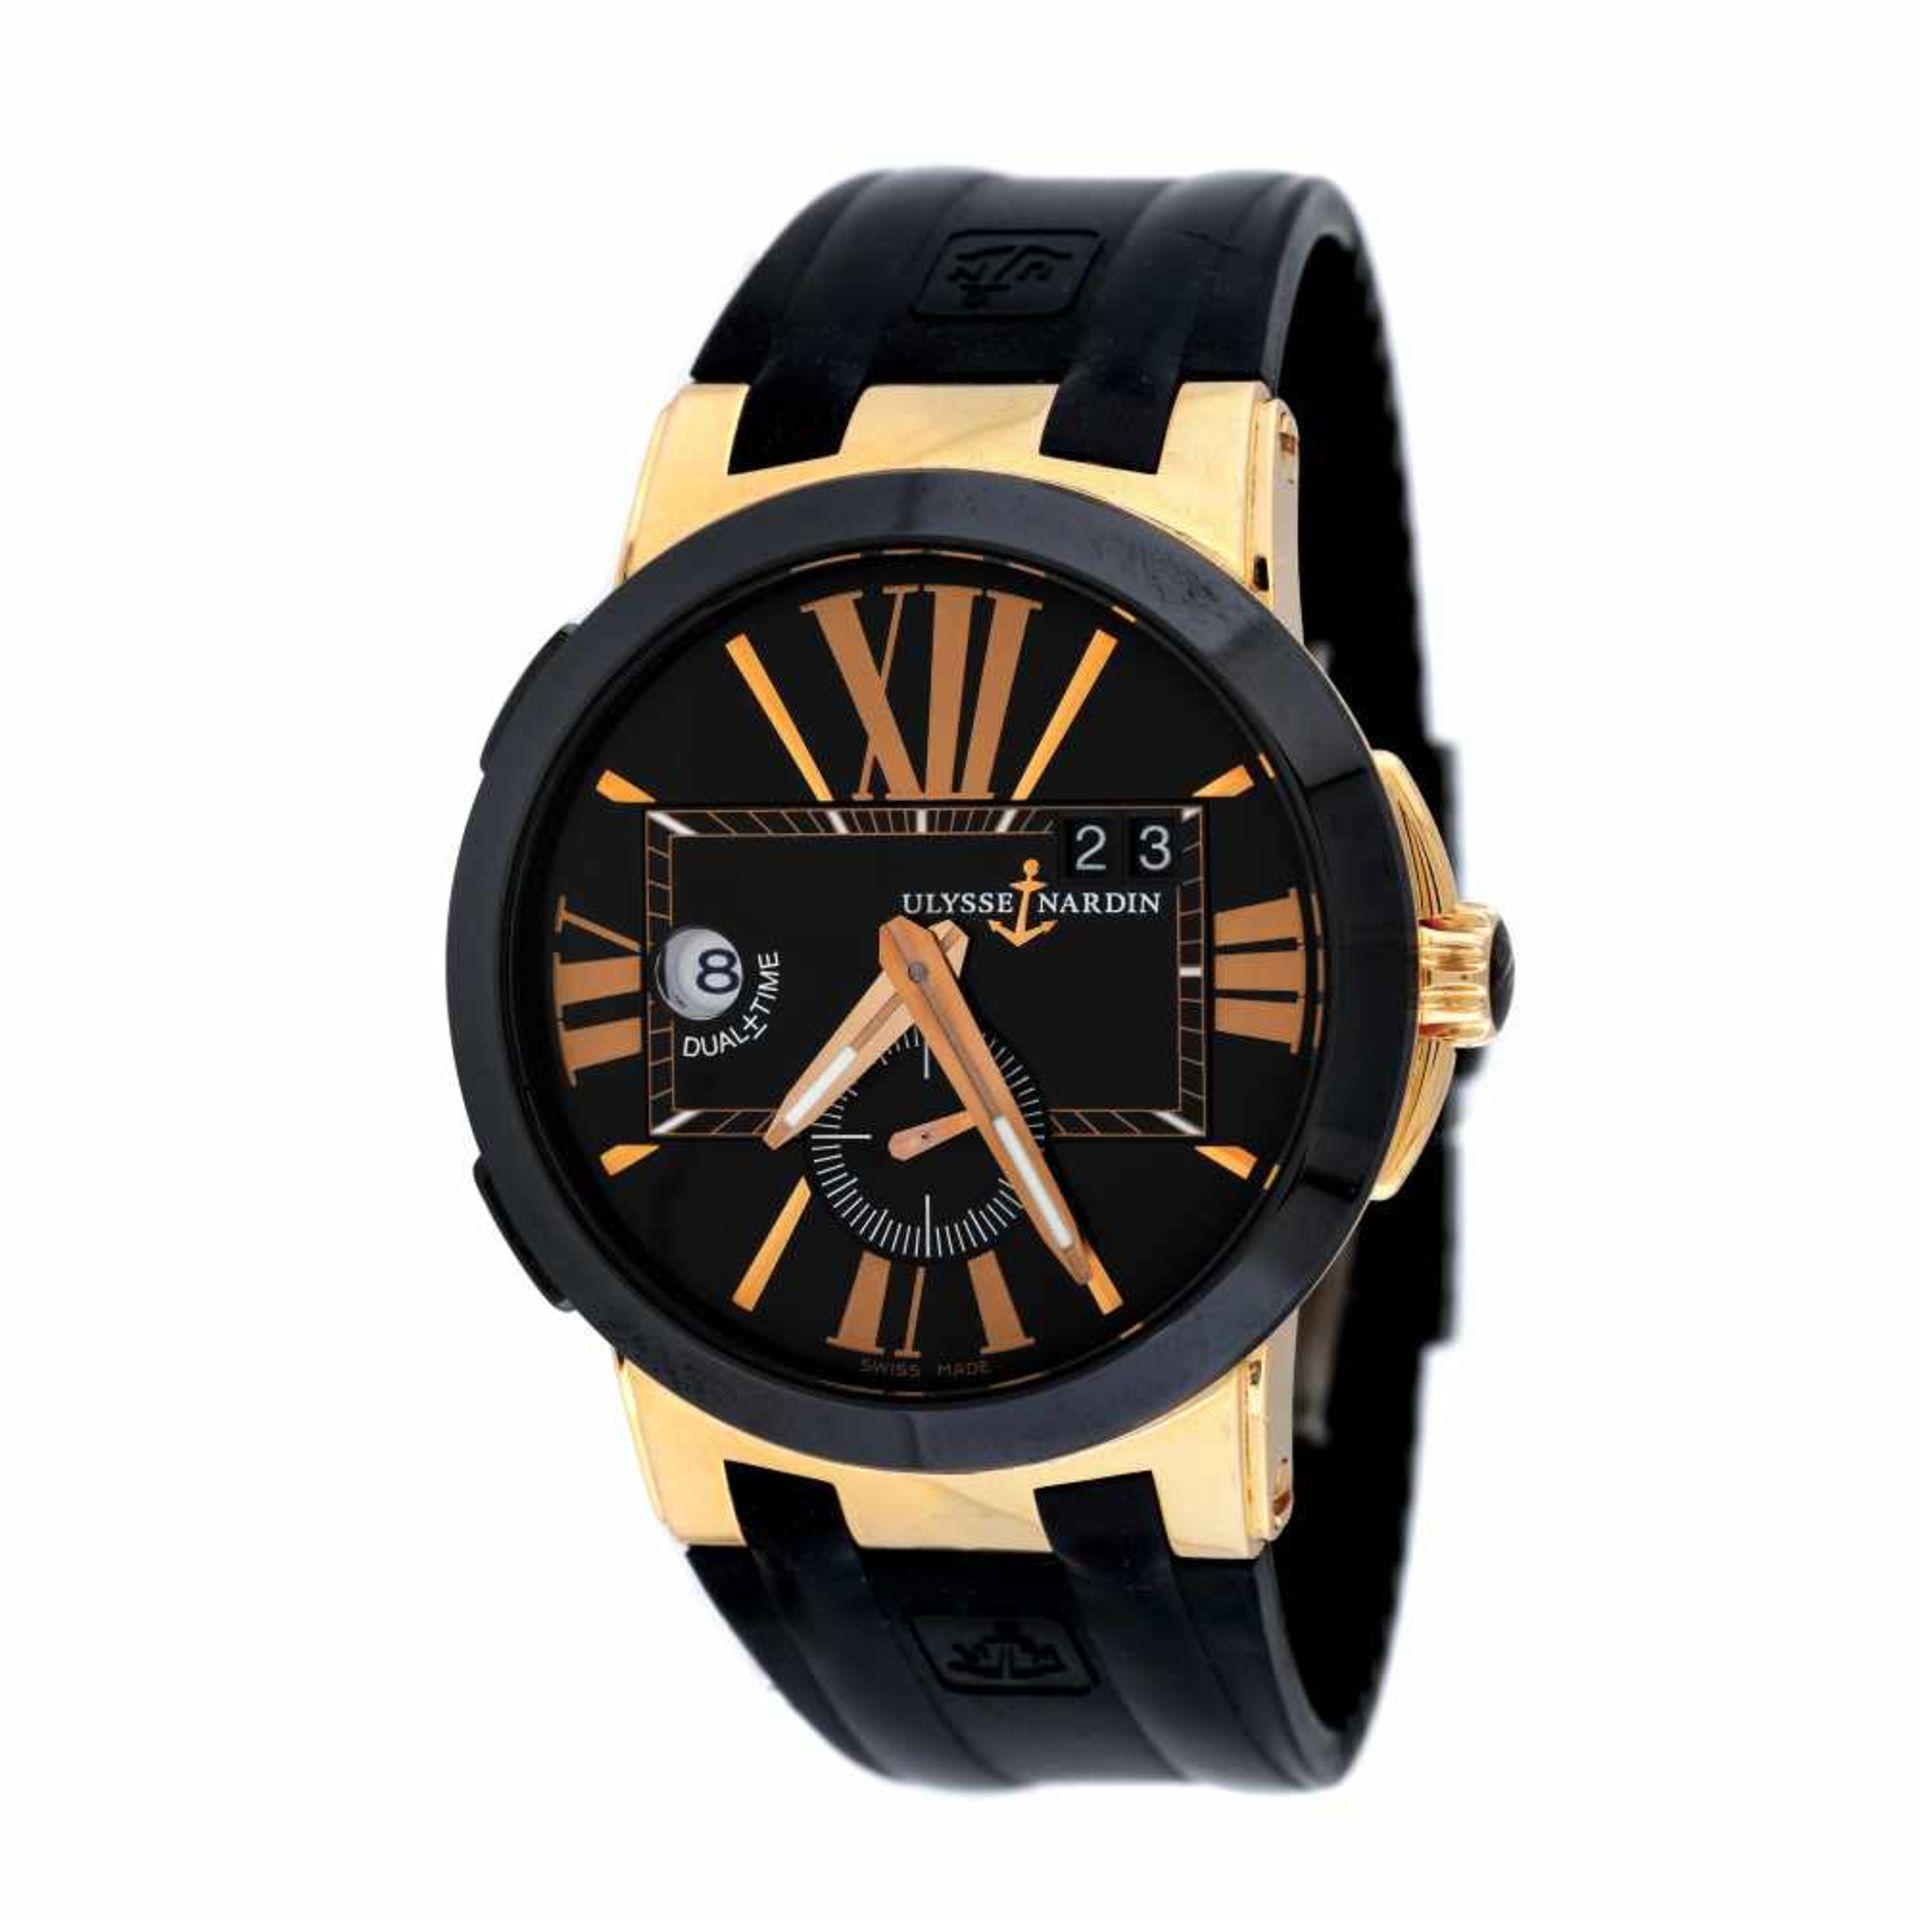 Ulysse Nardin Executive Dual Time wristwatch, rose gold, men, provenance documents